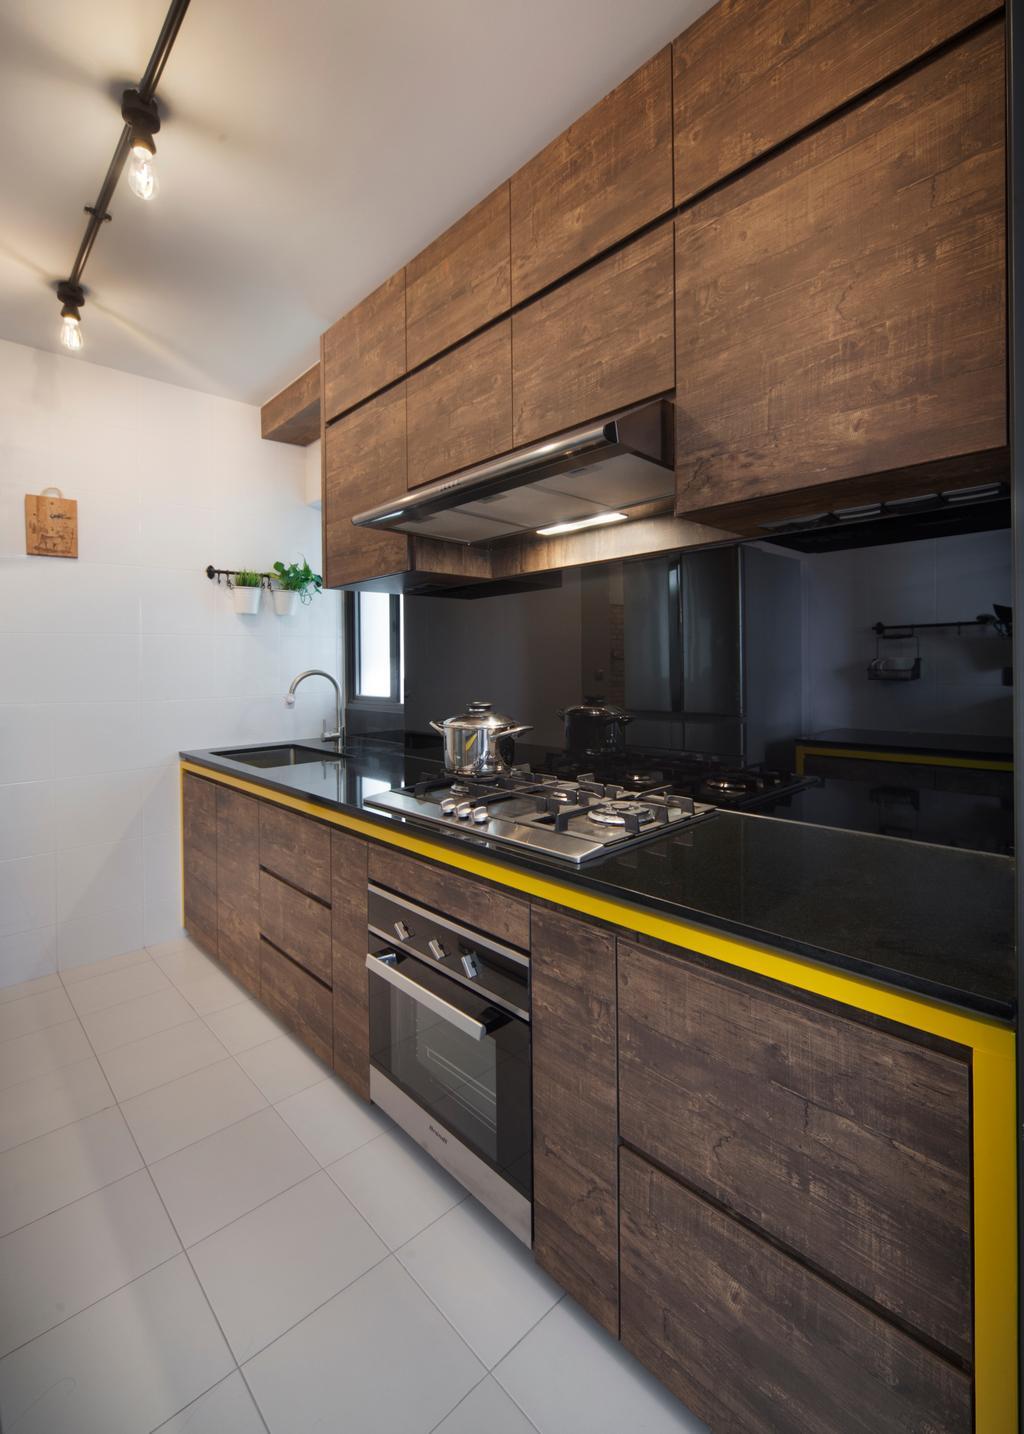 Transitional, HDB, Kitchen, Skyville@Dawson (Block 88), Interior Designer, The Scientist, Indoors, Interior Design, Room, Appliance, Electrical Device, Oven